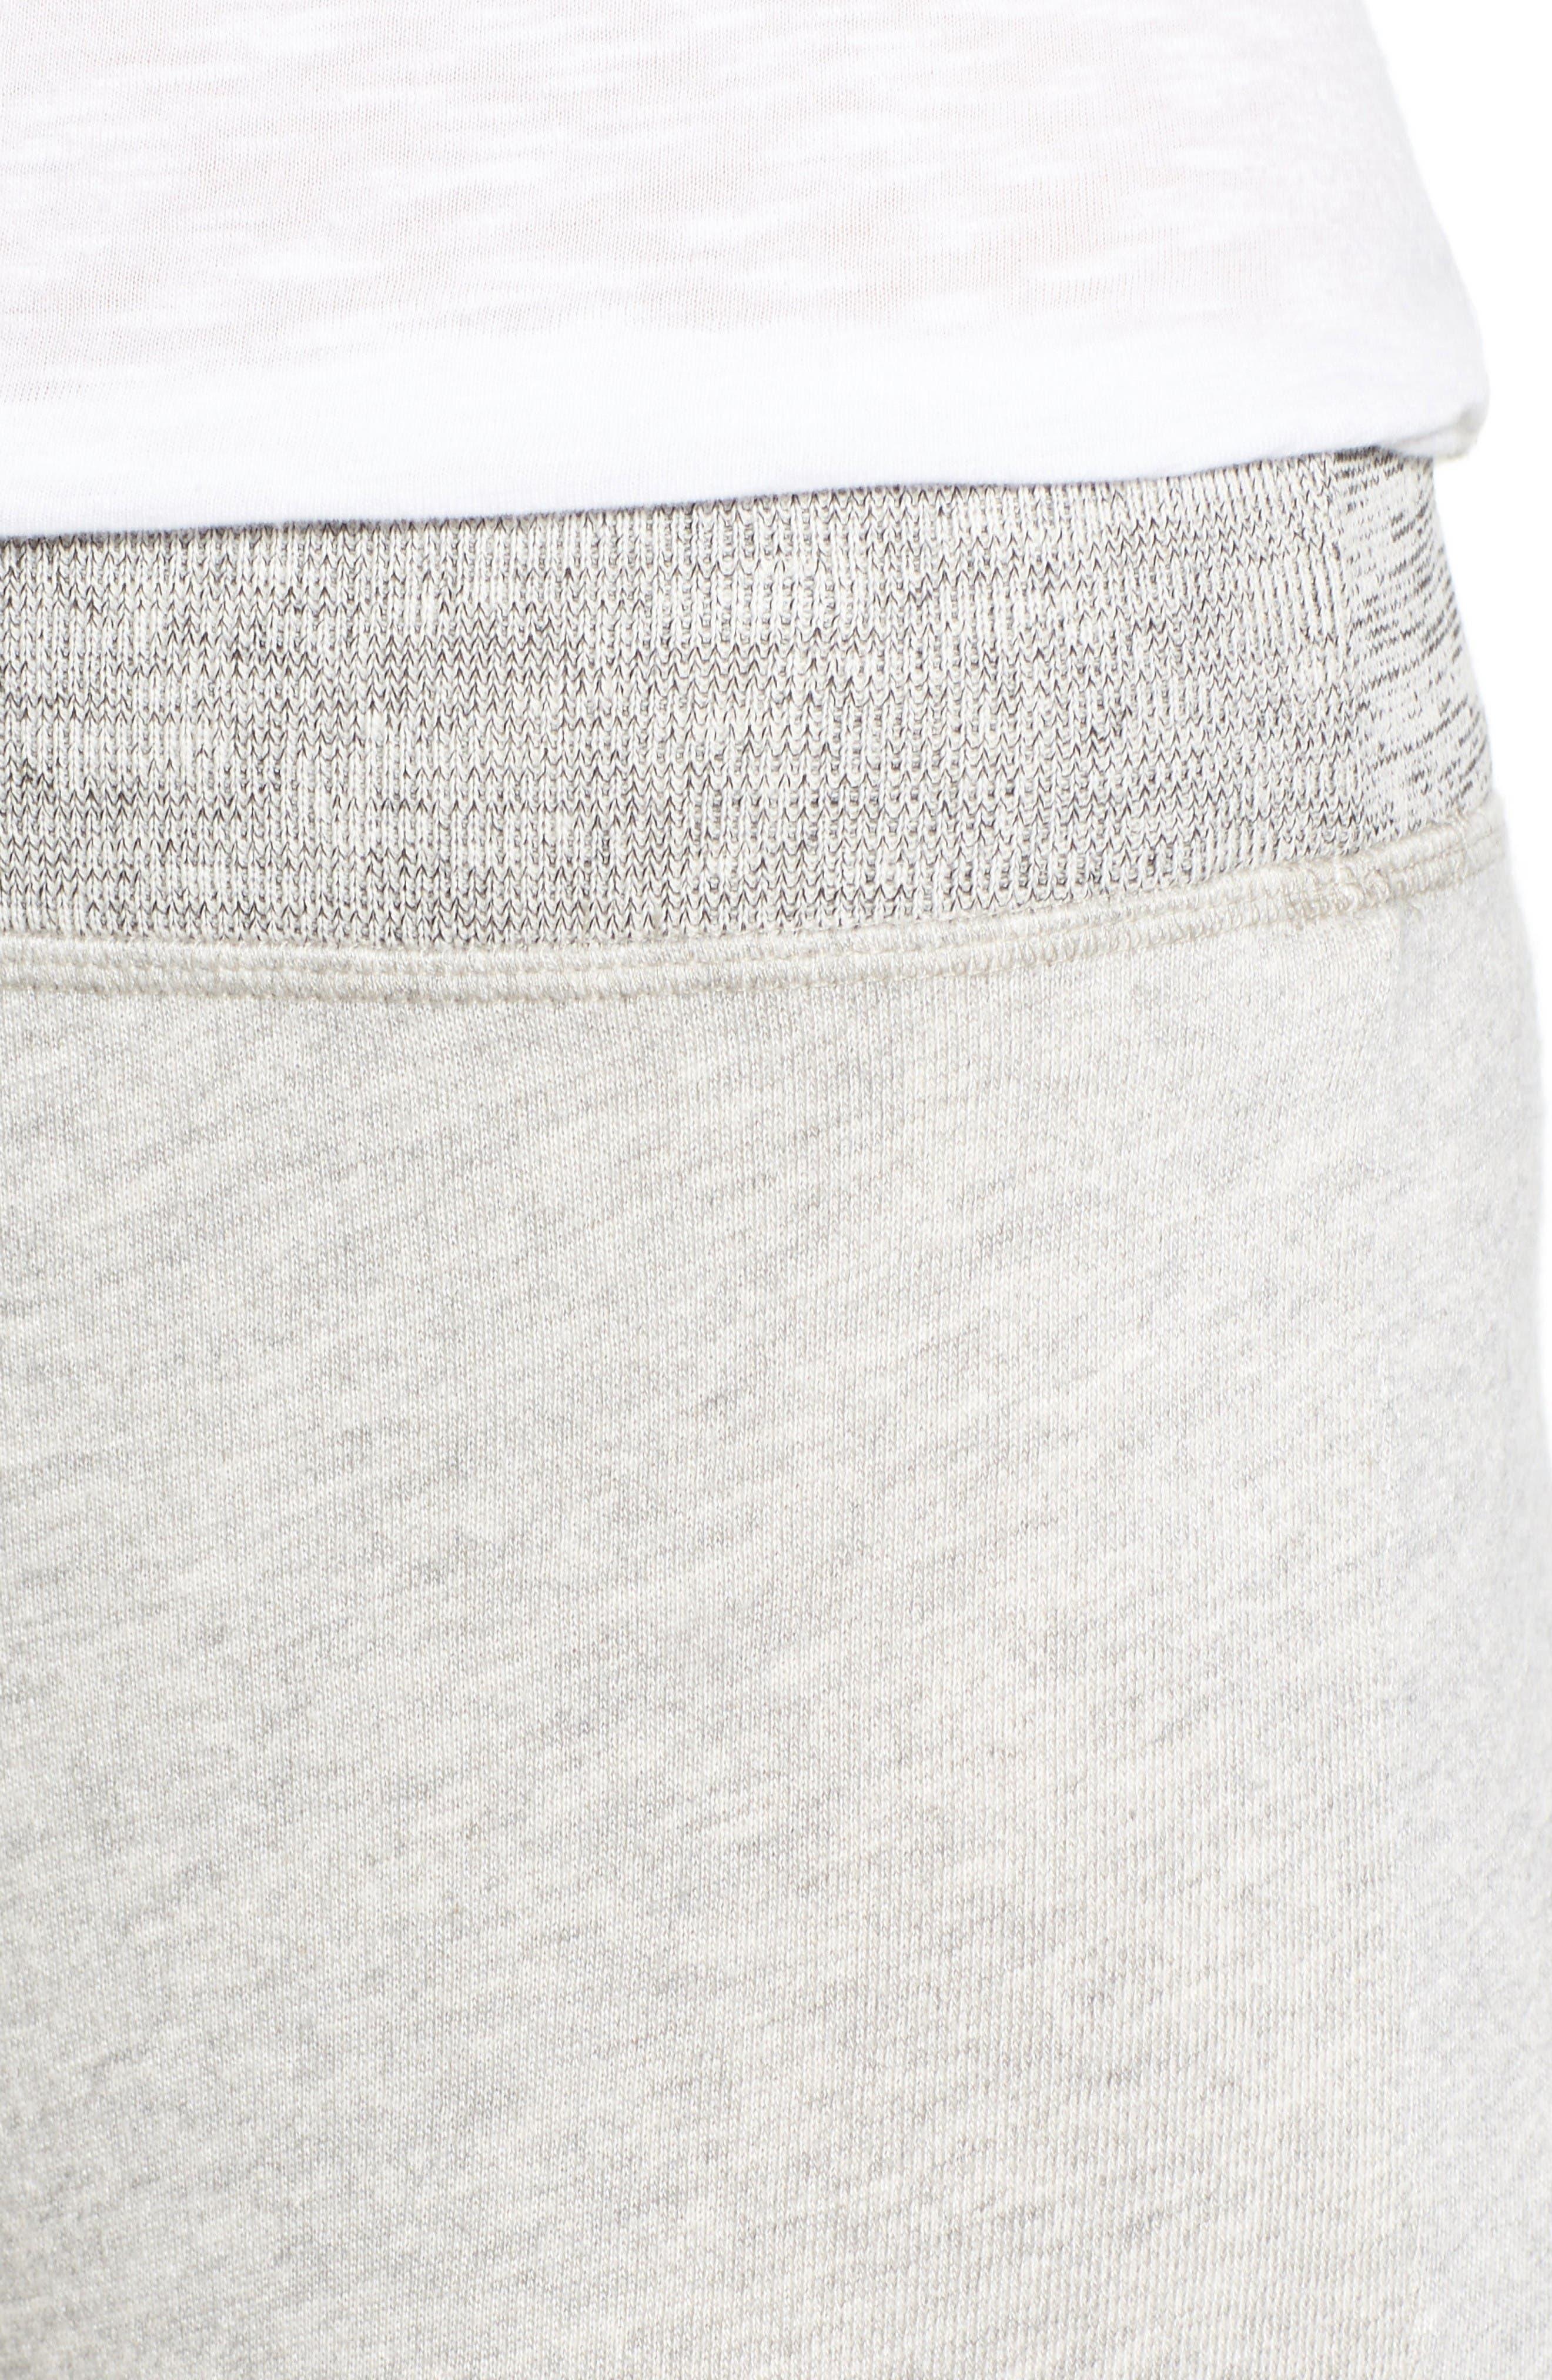 Isla High Waist Crop Sweatpants,                             Alternate thumbnail 4, color,                             Heather Grey